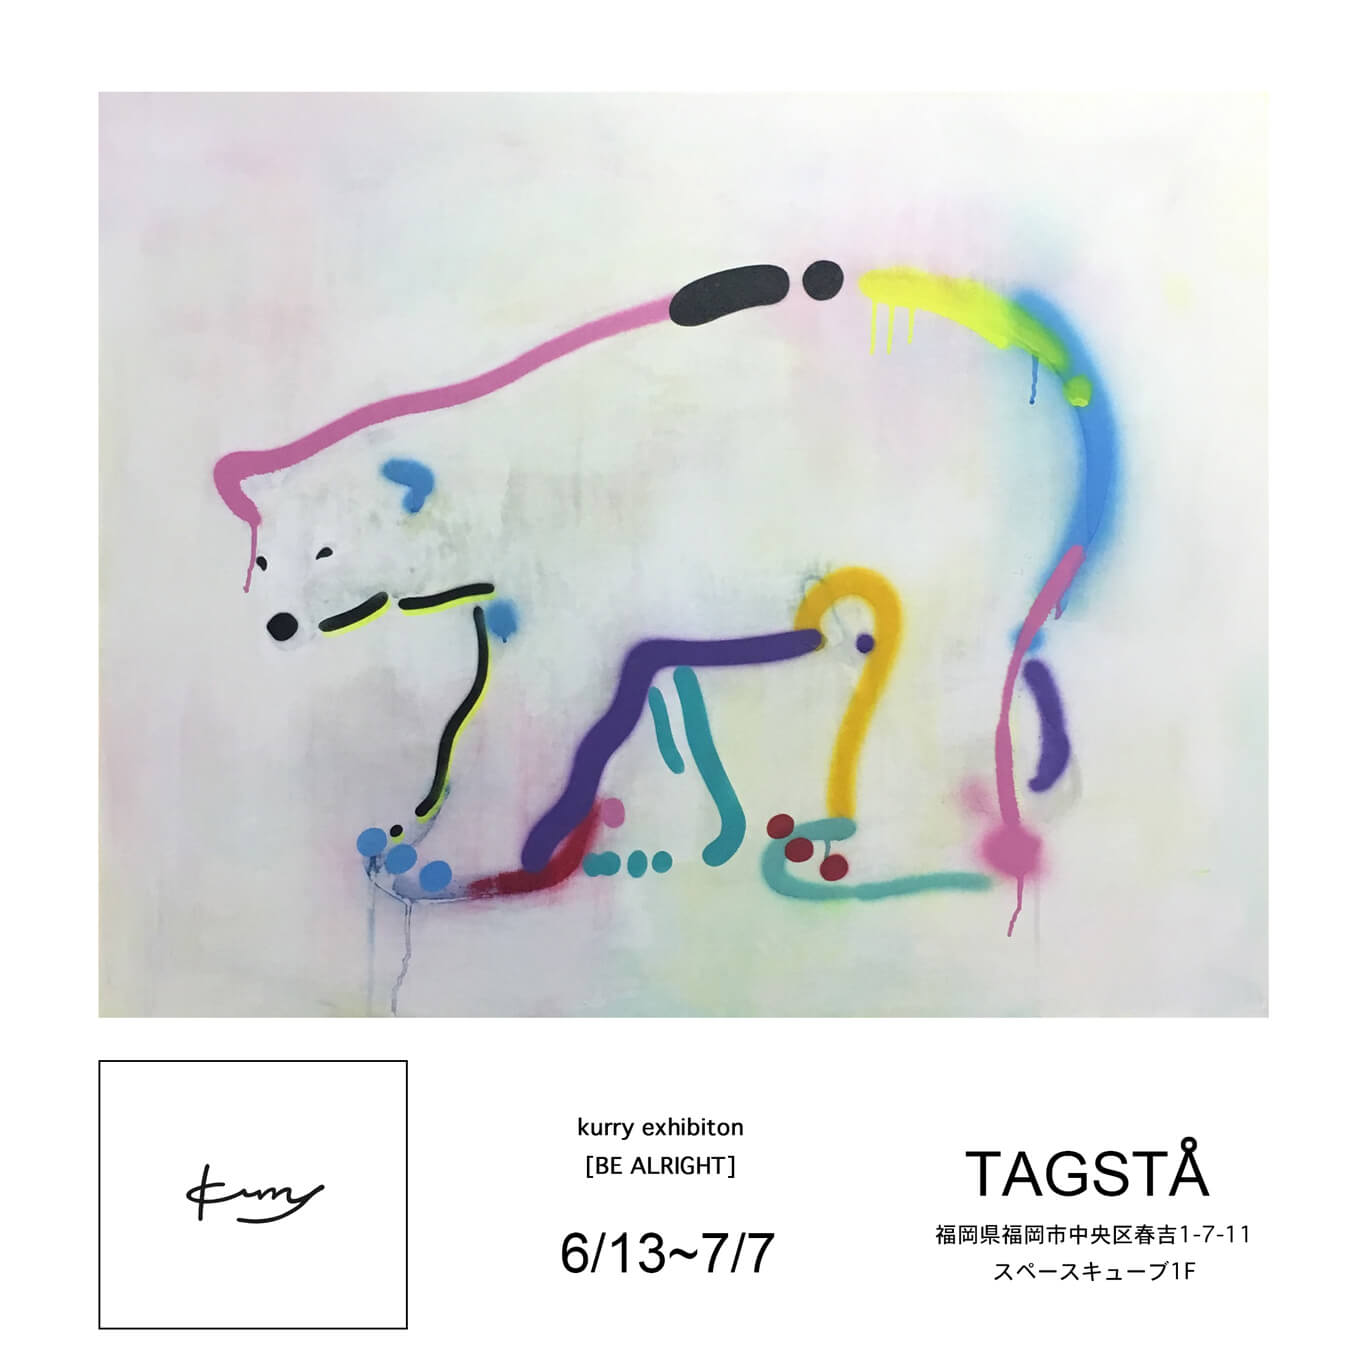 tagsta-201906-kurry-個展